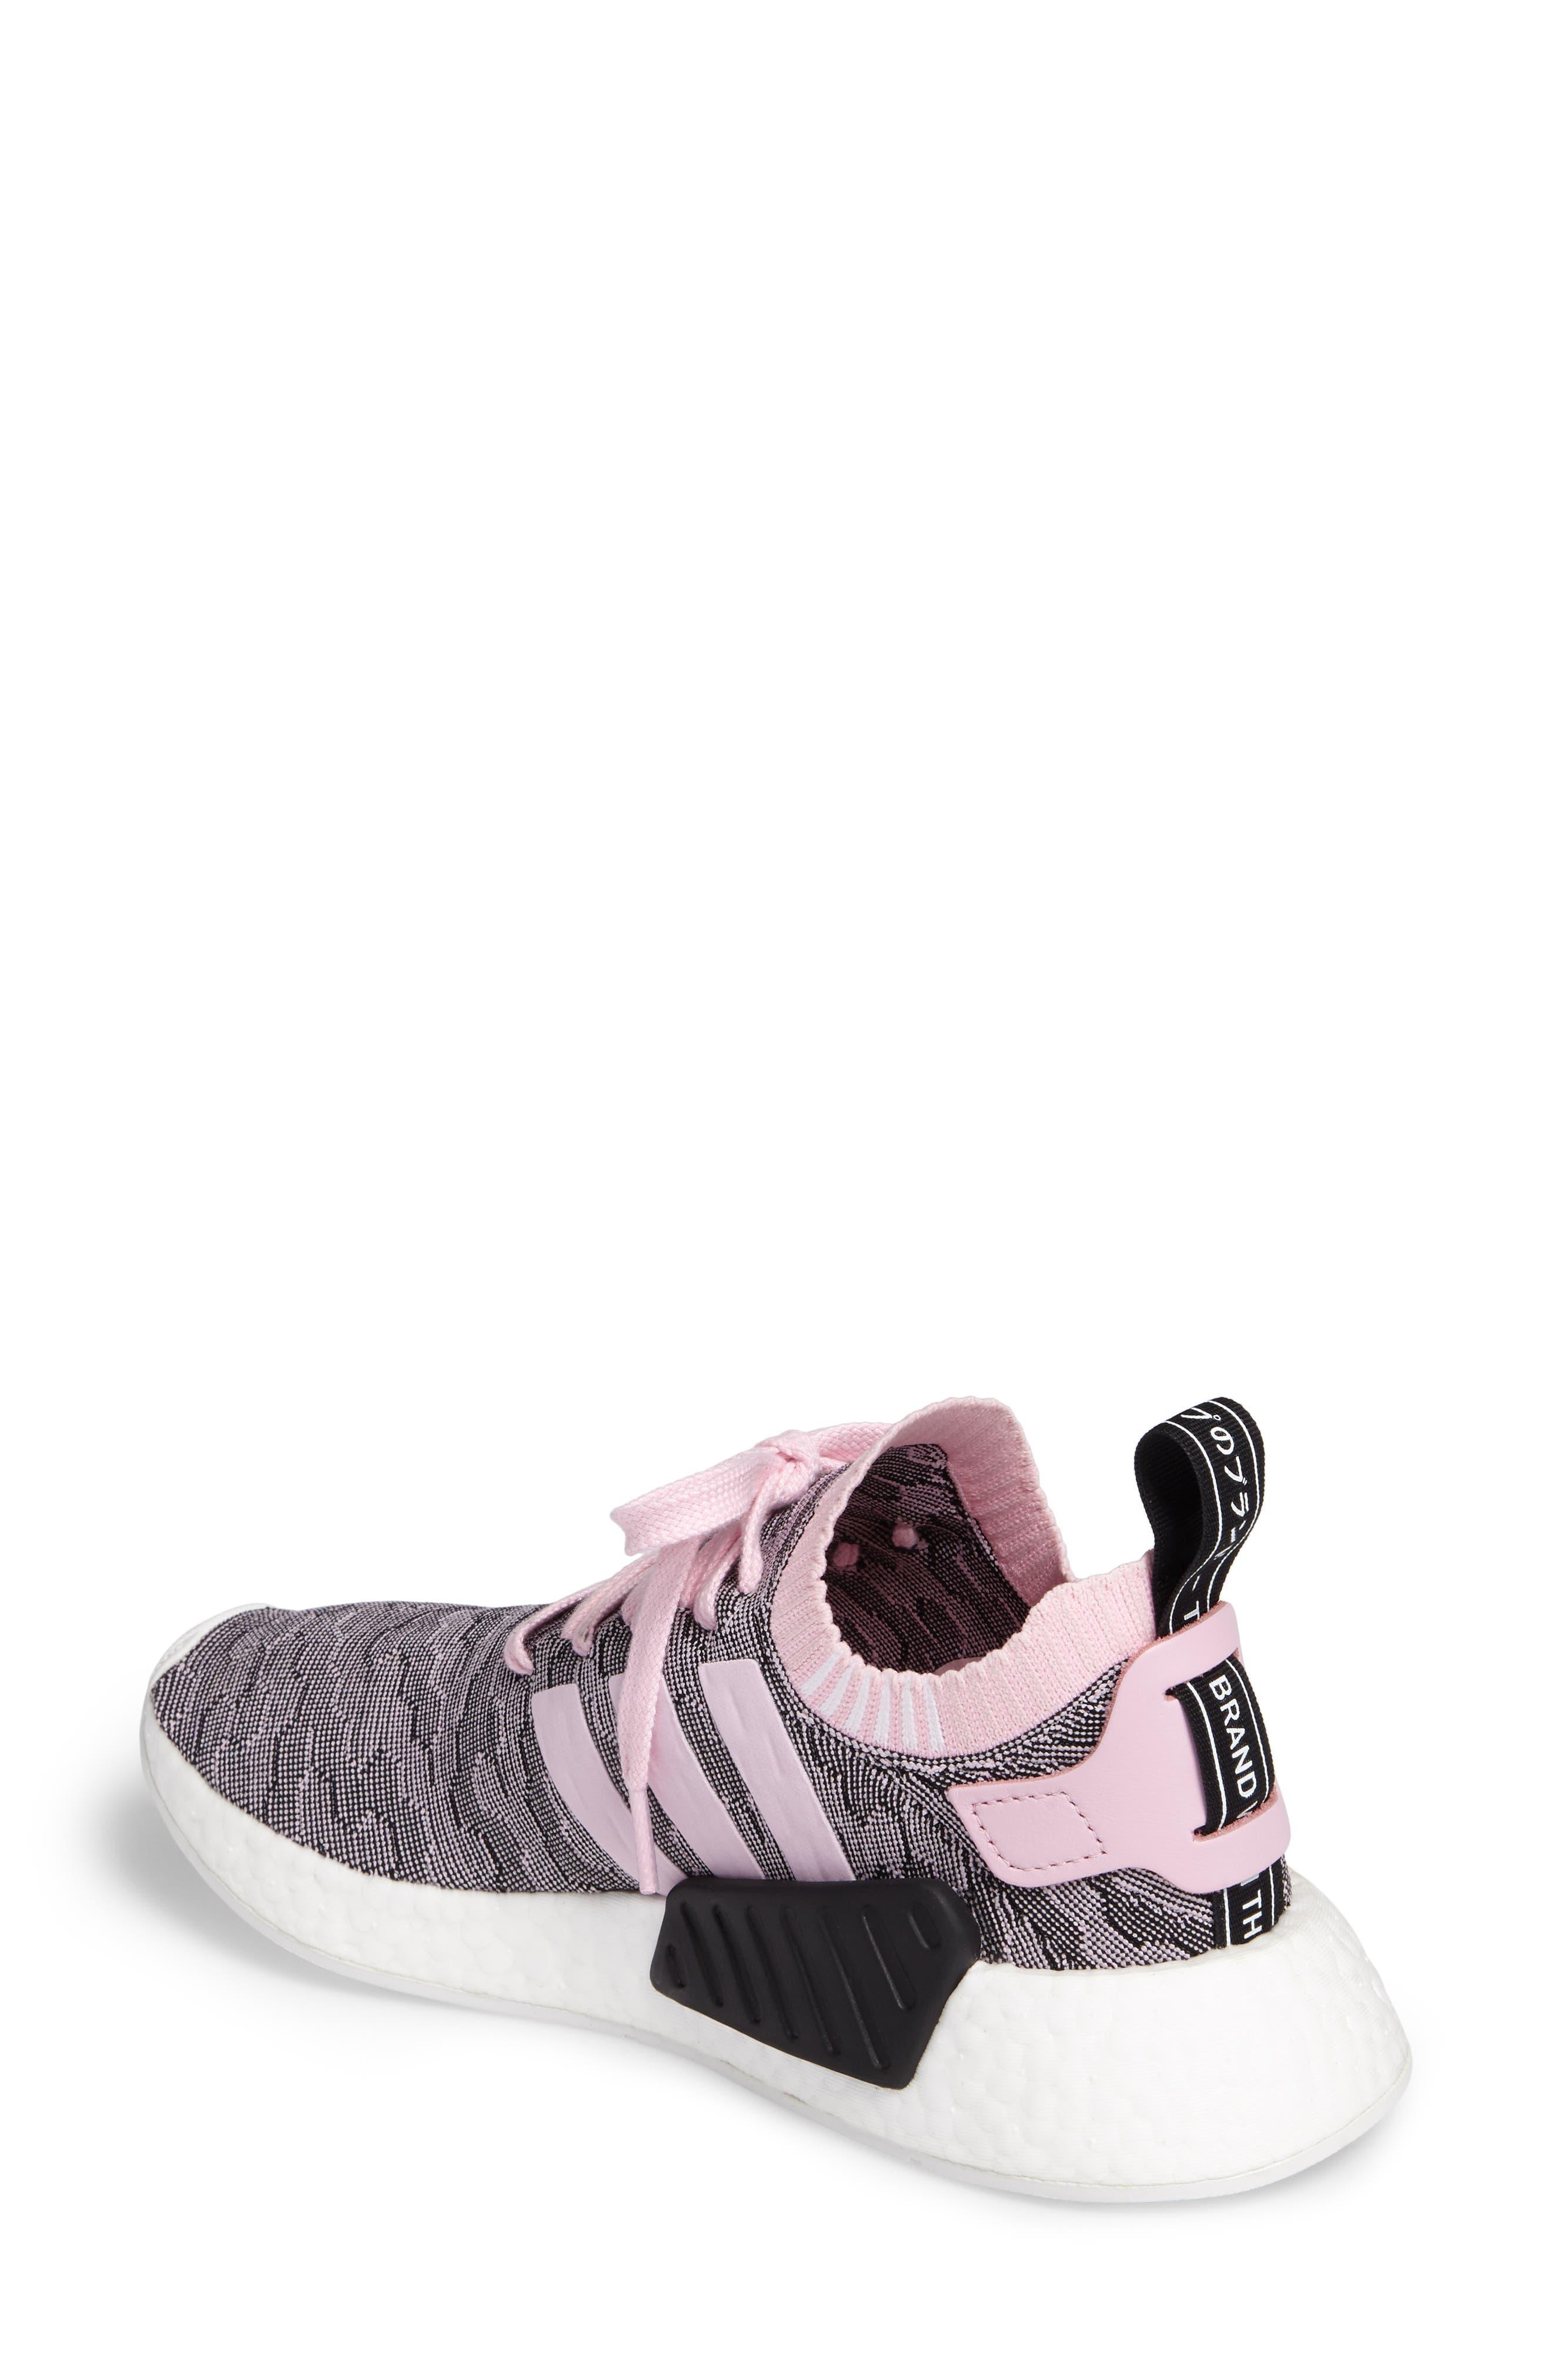 NMD R2 Primeknit Athletic Shoe,                             Alternate thumbnail 2, color,                             Wonder Pink/ Wonder Pink